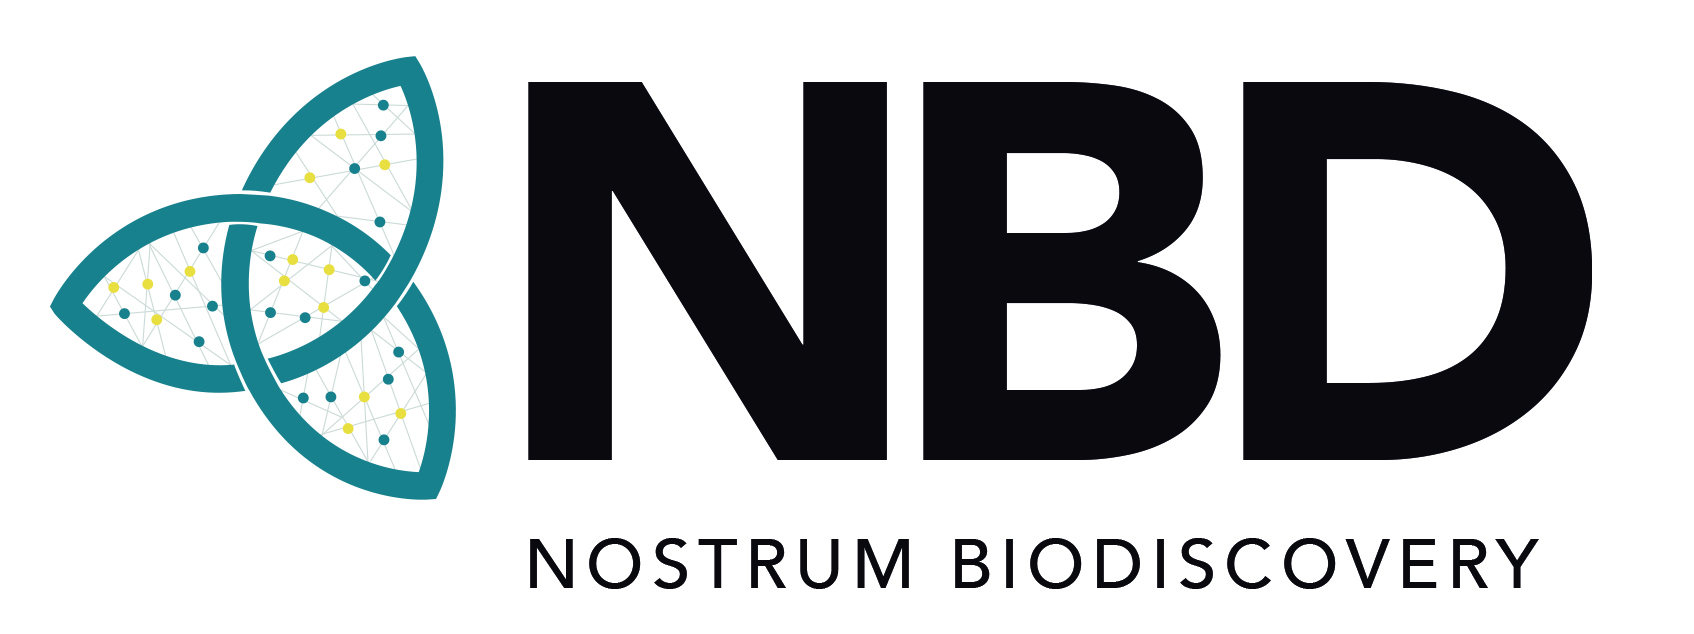 Nostrum Biodiscovery